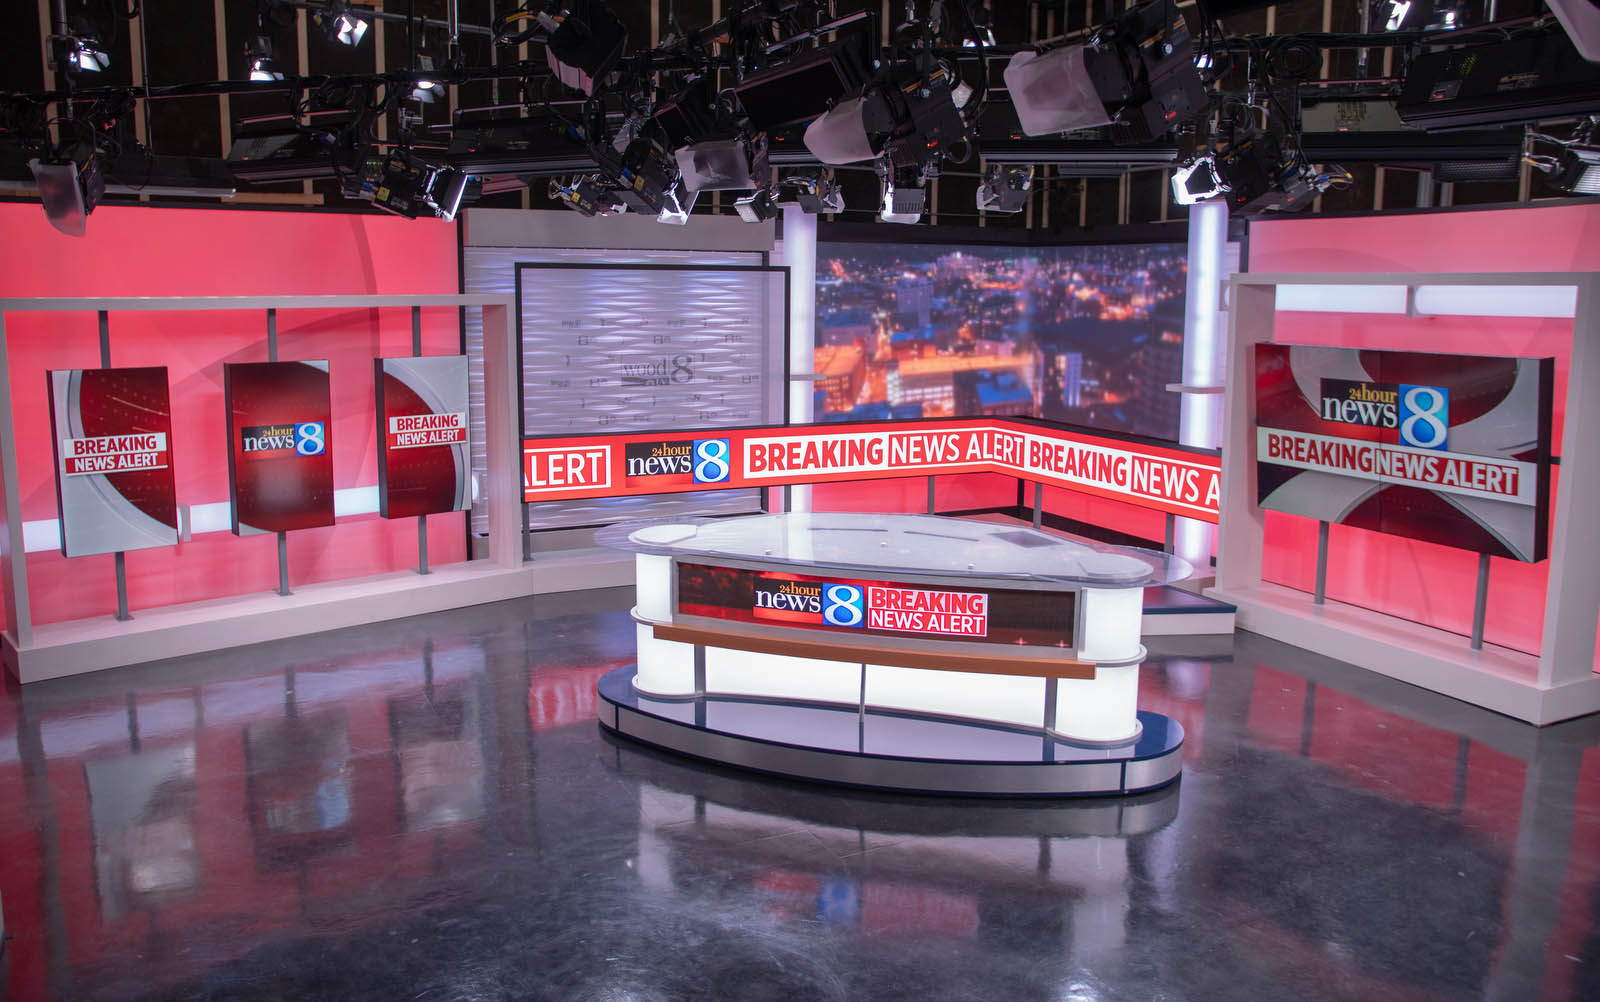 WOOD TV 8 Live Coverage Studio